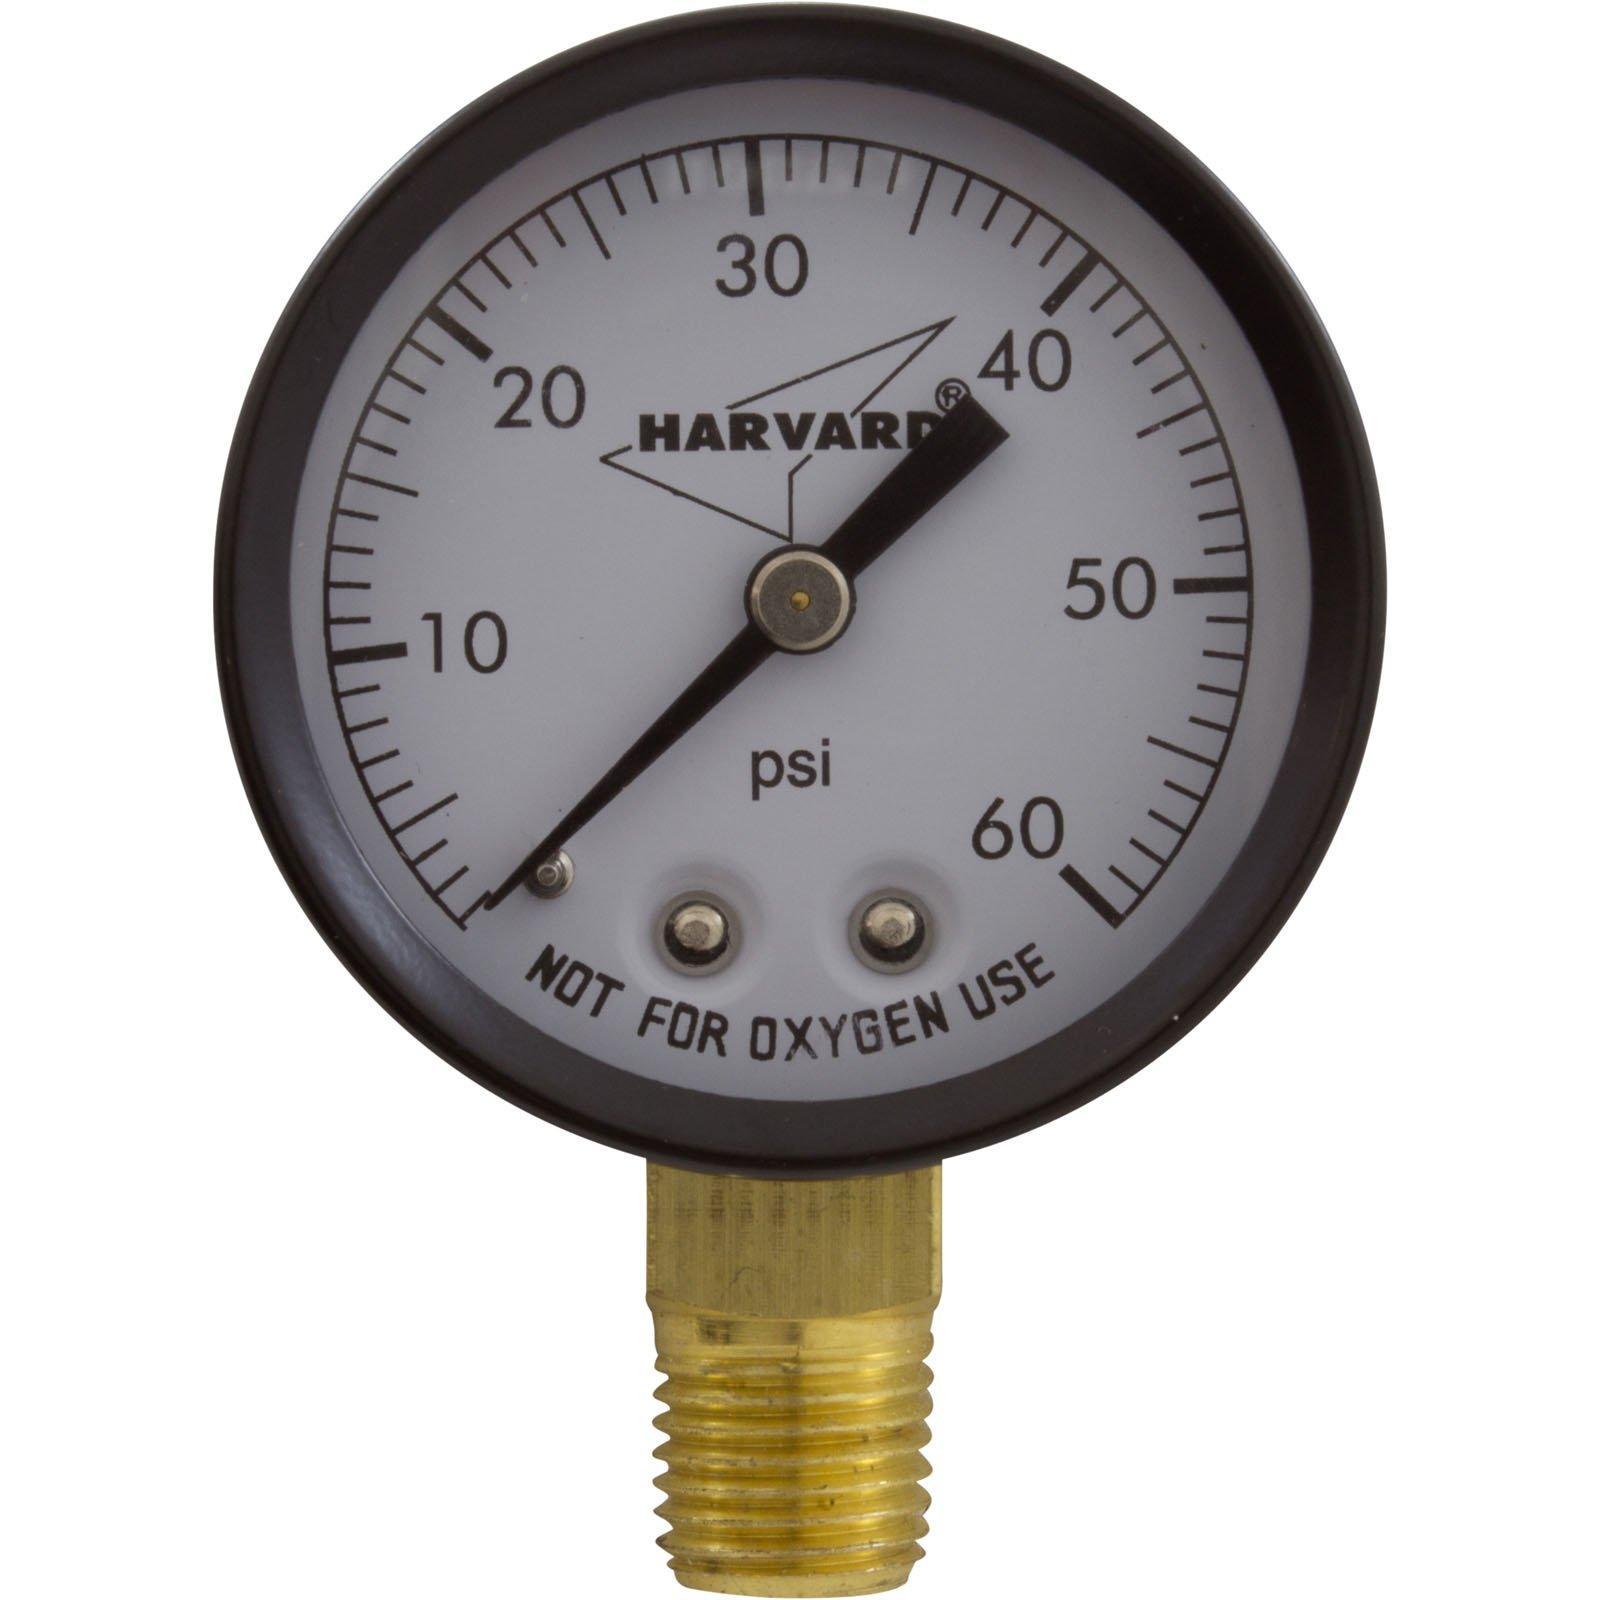 2 Inch Pool Filter Pressure Gauge 0 60 Psi Bottom Mount